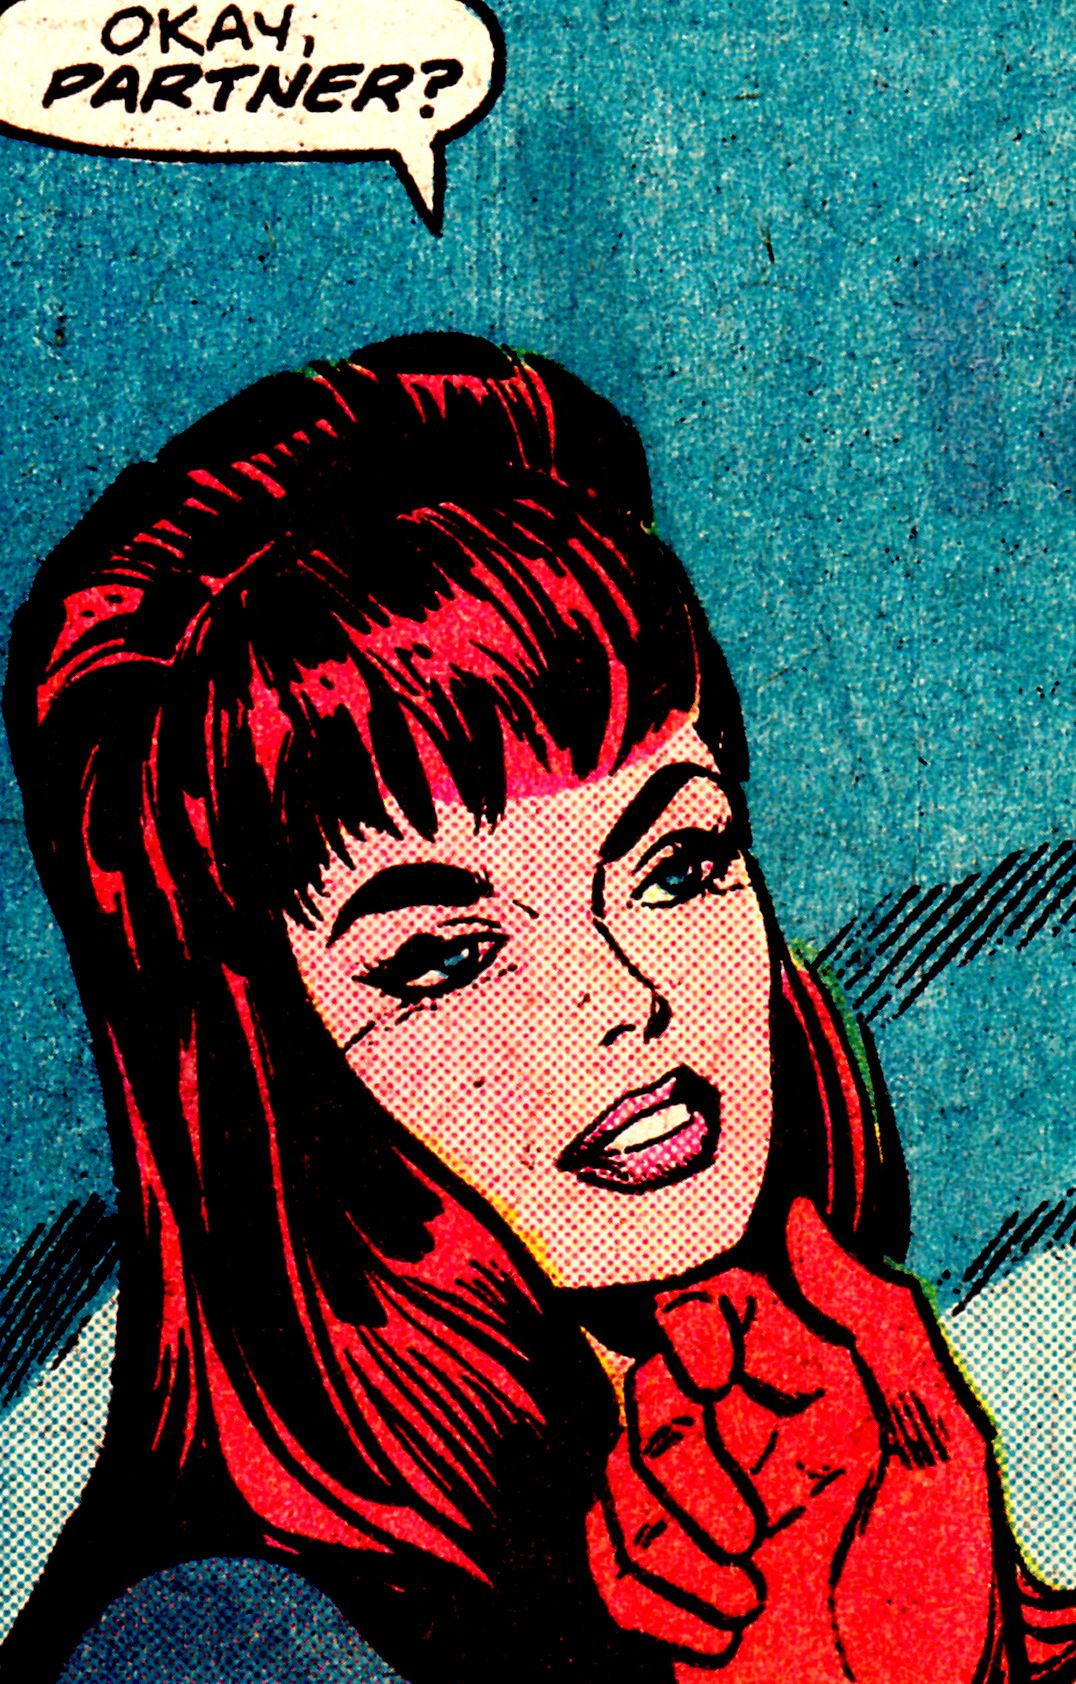 Natasha Romanoff  Daredevil #122 (June 1975) Art by Bob Brown & Vince Colleta Words by Tony Isabella